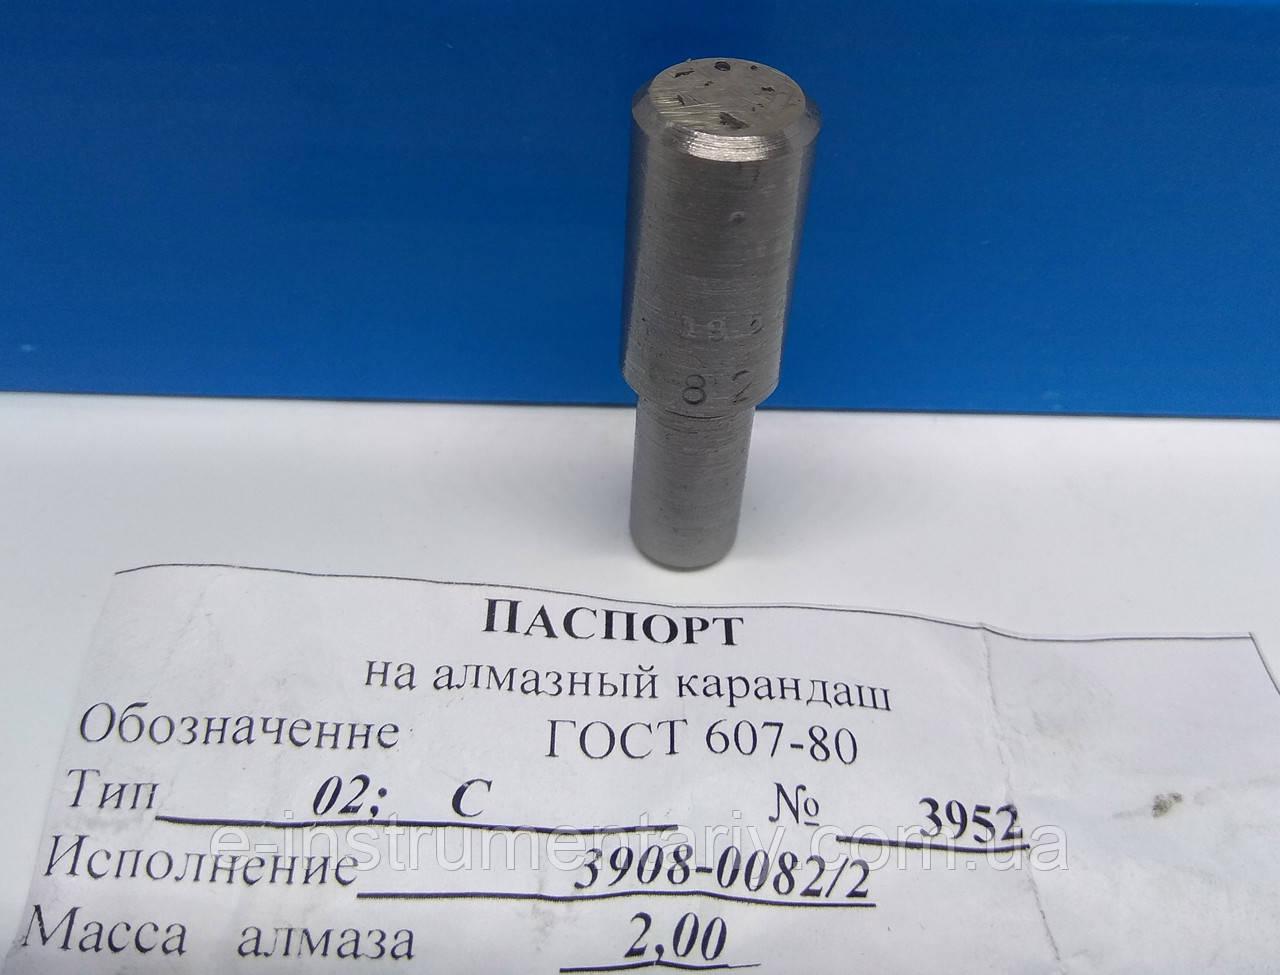 Карандаш алмазный 3908-0082/2 тип 02 исп.С 1,0 карат. качество- 2